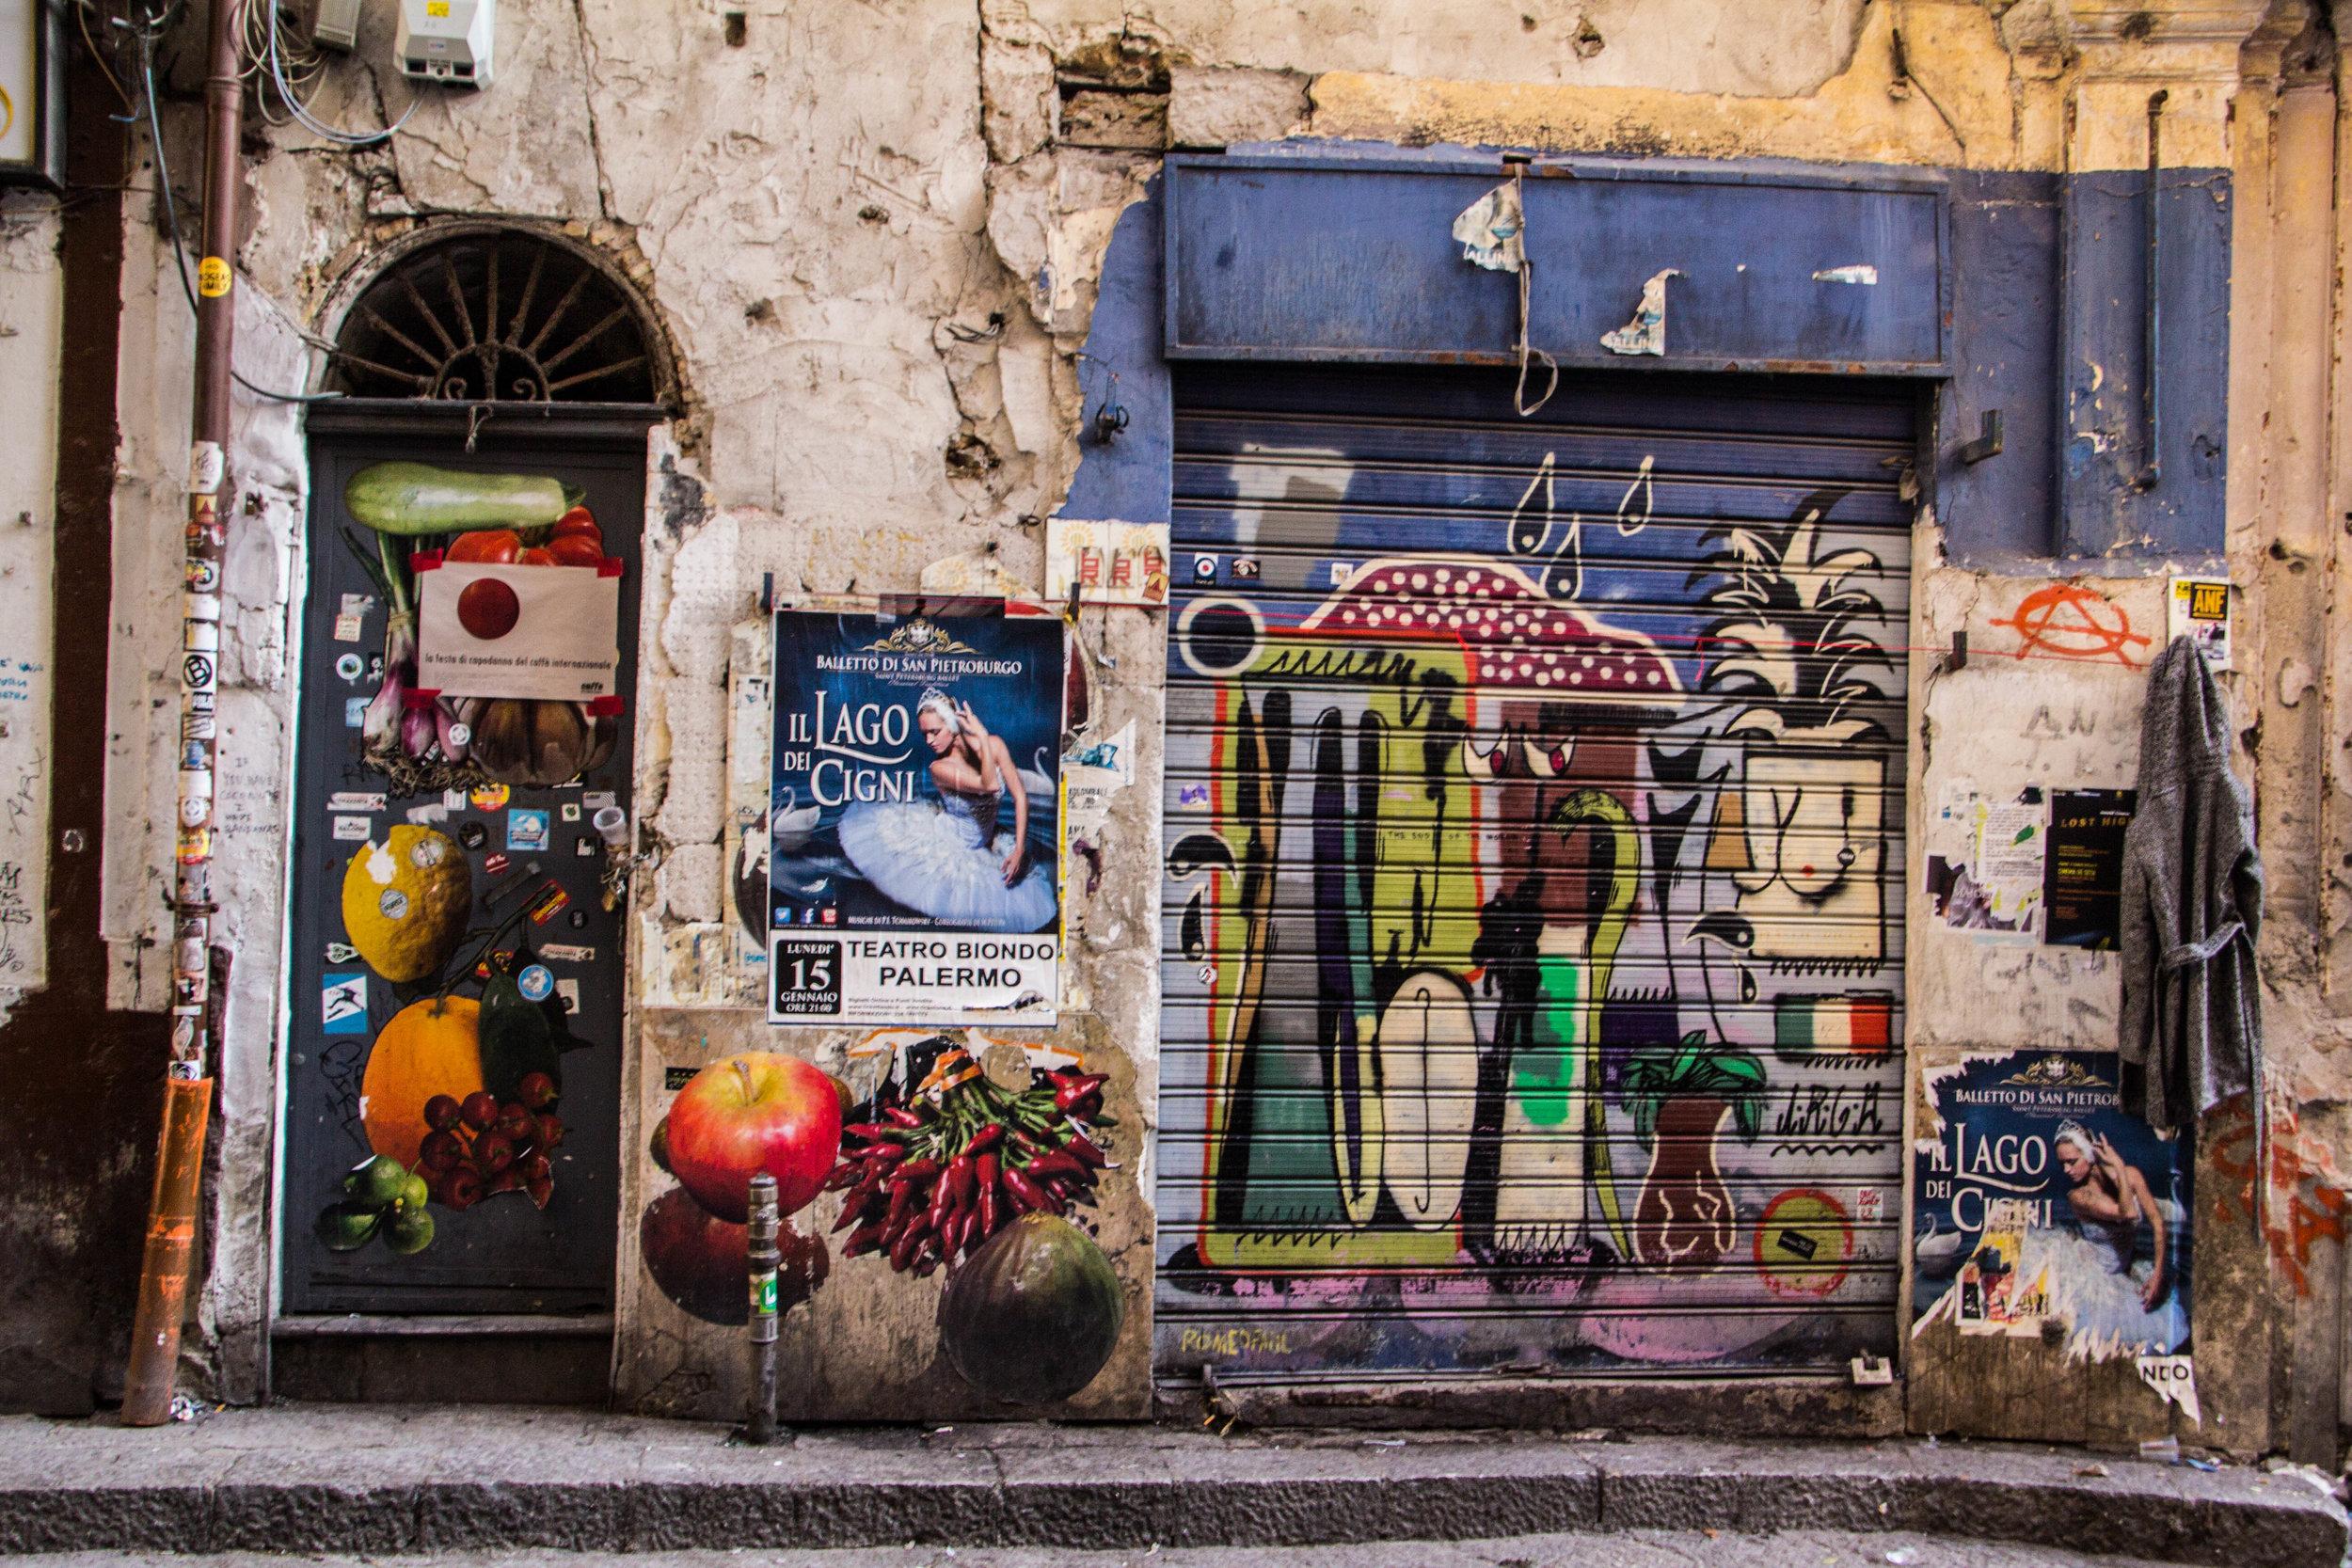 street-art-palermo-sicily-20.jpg